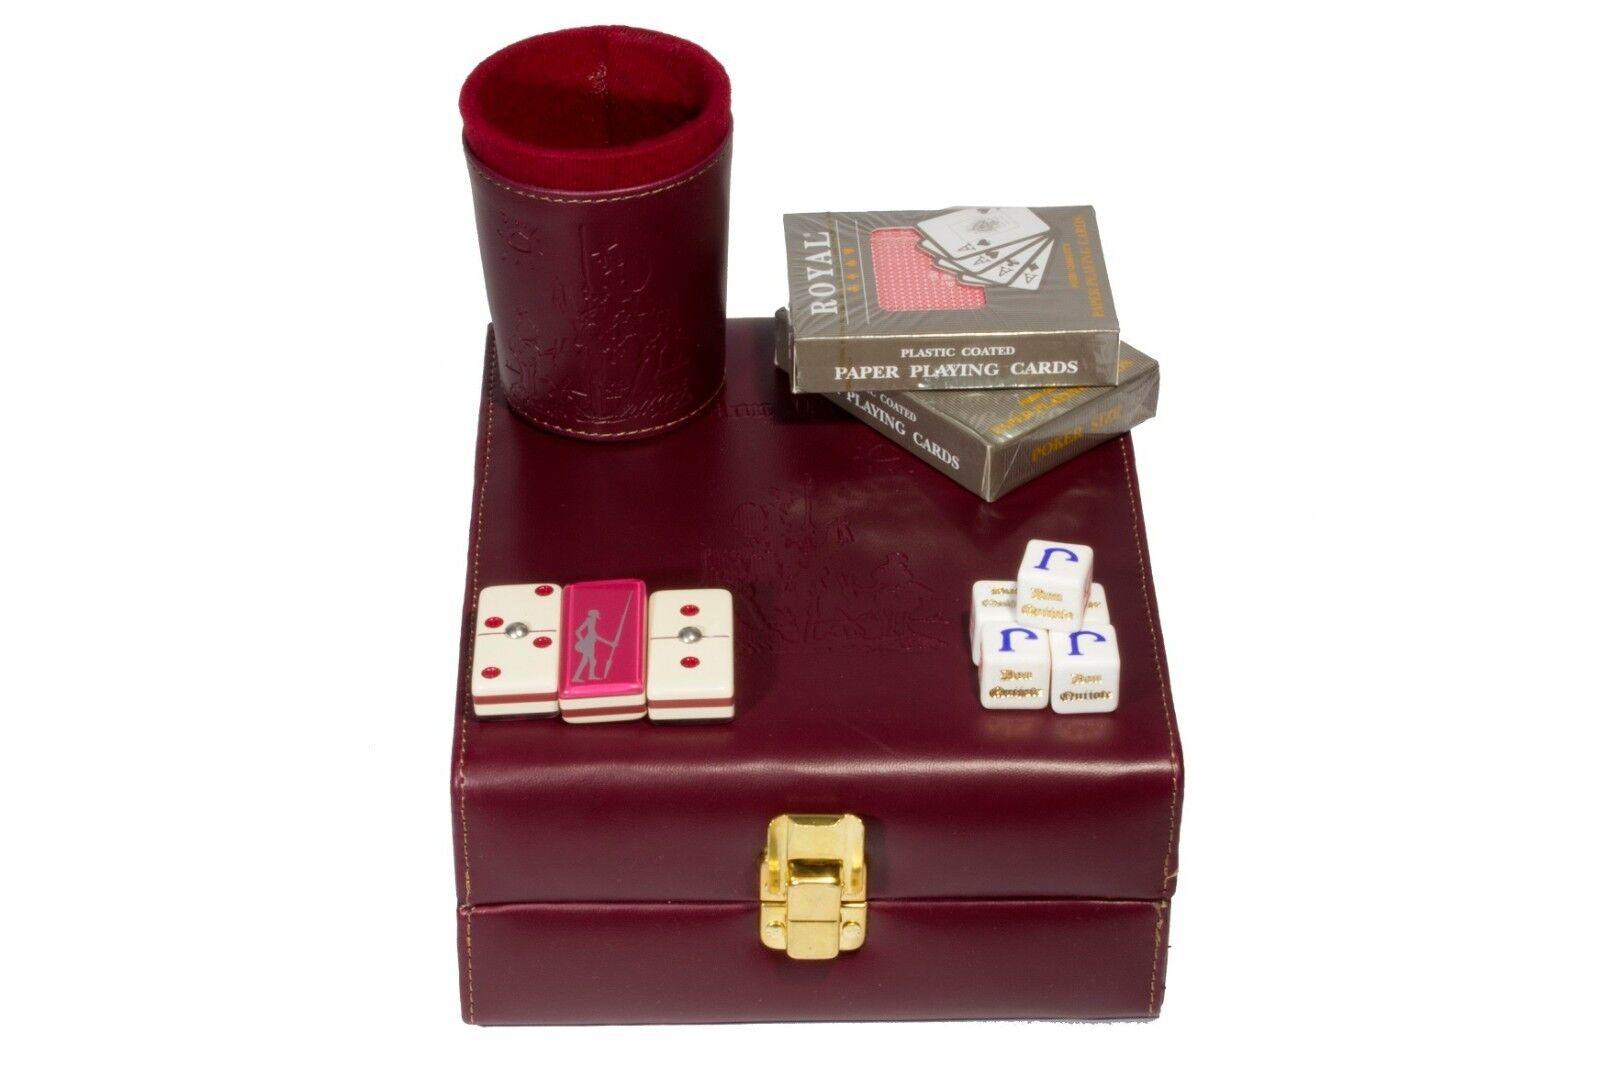 Don Quixote Deluxe Set 3 Games  Domino, Domino, Domino, Dice Cup, 2 Poker Cards. Burgundy bdc556